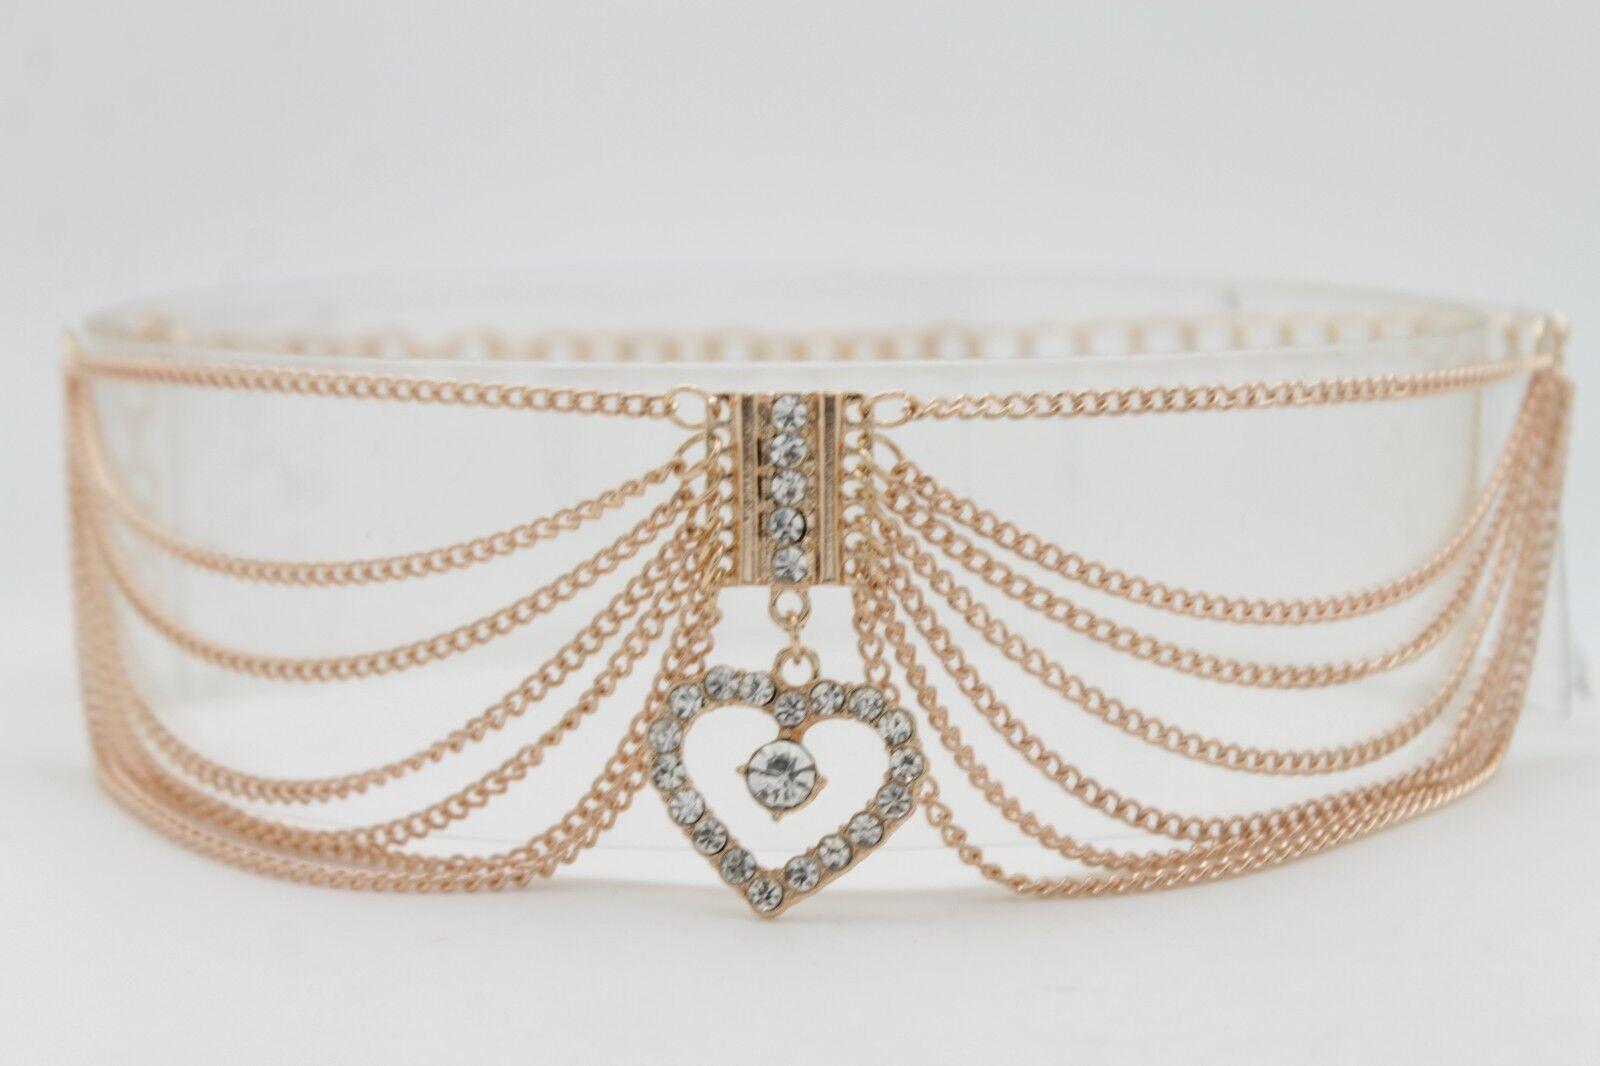 Women Gold Metal Chain Boot Bracelet Anklet Shoe Love Charm Jewelry Heart Gift